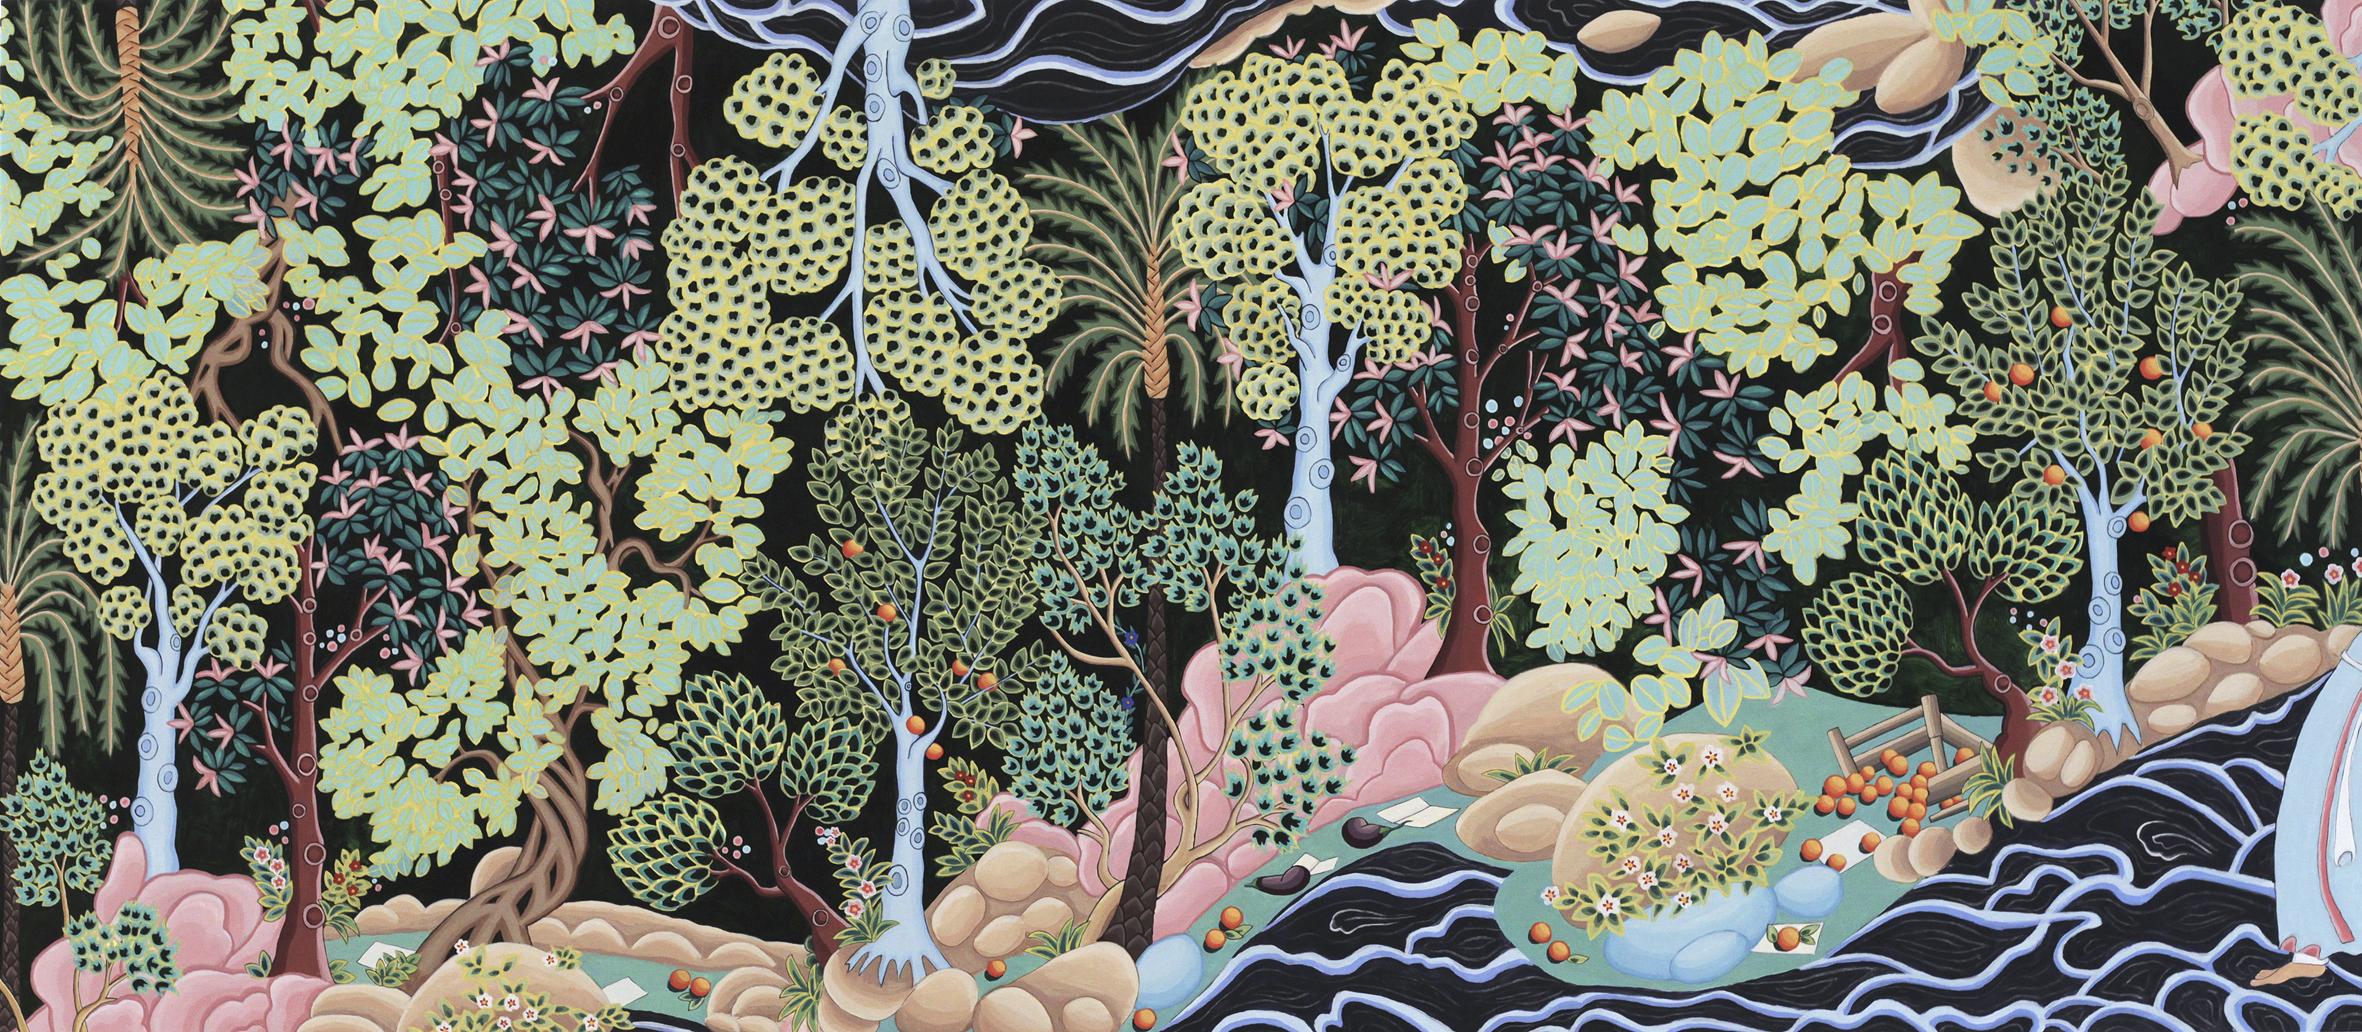 """Land of Darkness (Al-Khidr),"" handmade egg tempera on panel, 55 x 125 cm, 2018."